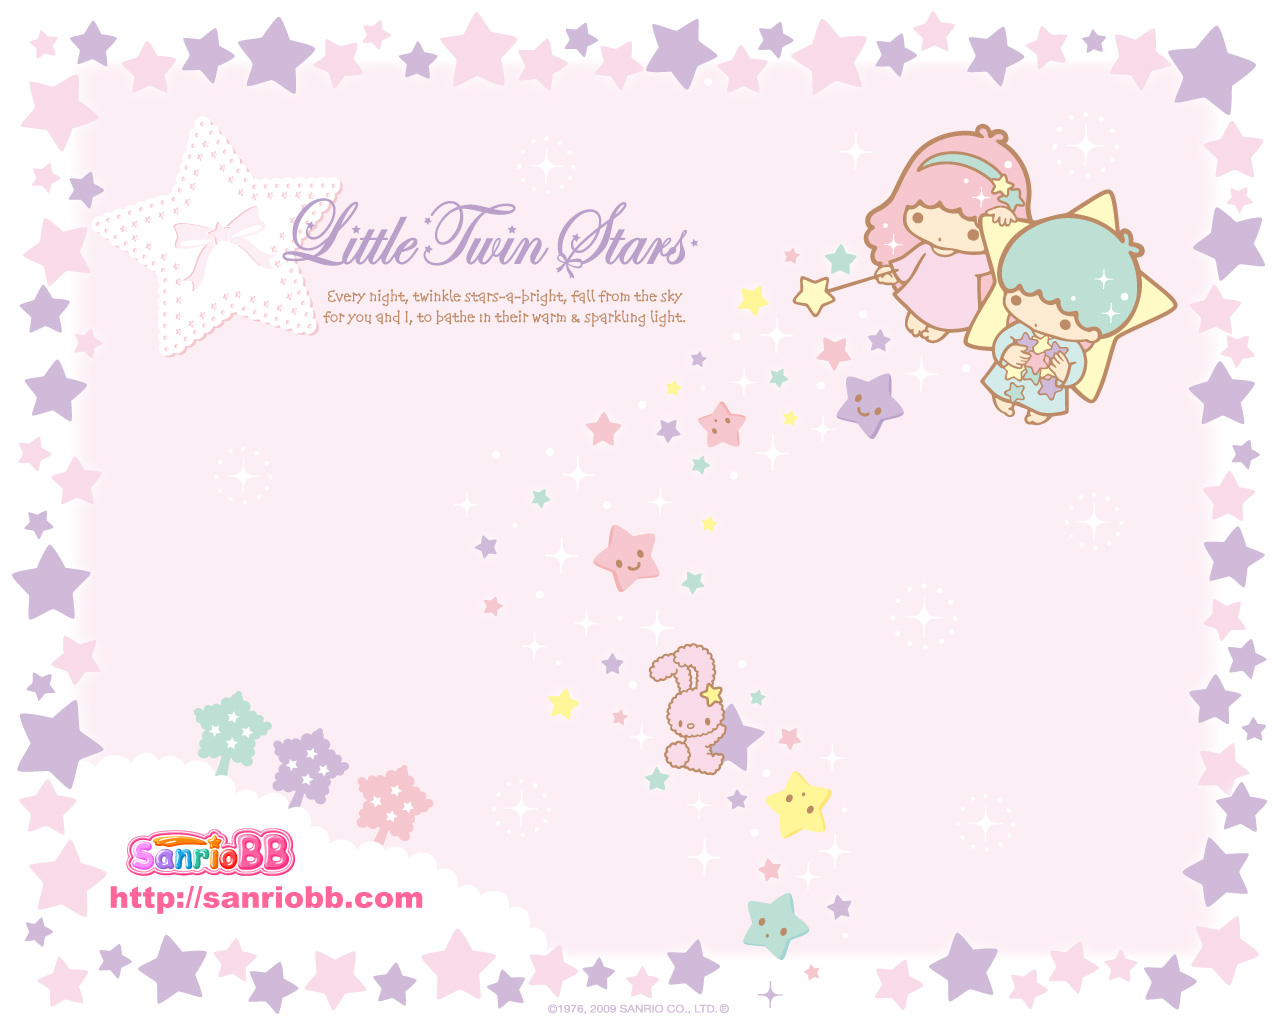 Wallpaper: Little Twin Stars Wallpaper (001) Little Twin Stars Wallpaper 2013